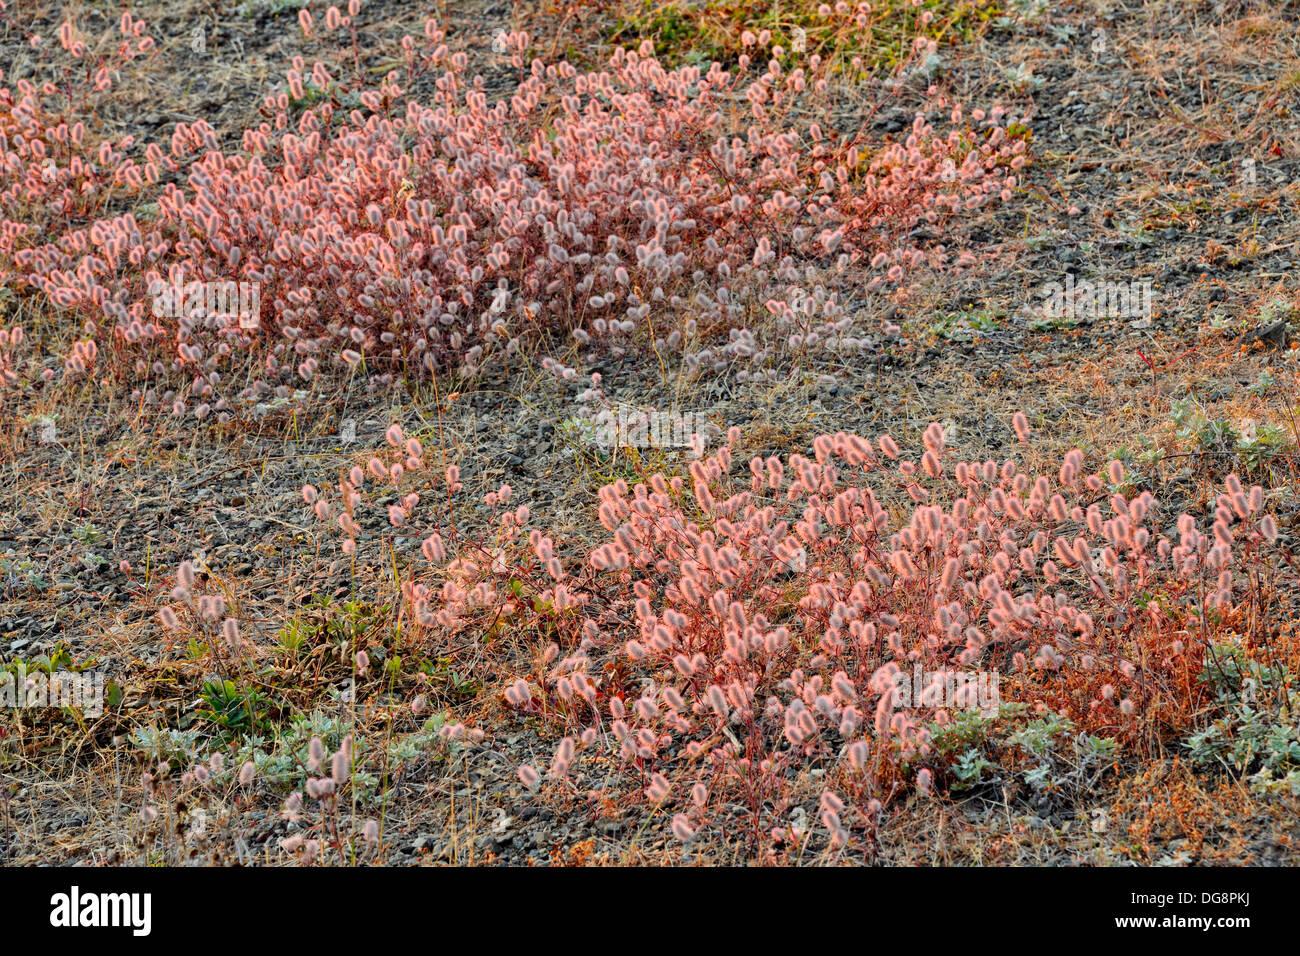 Hare'sfoot clover Trifolium arvense Flowering colonies road to Hurricane Ridge Olympic National Park Washington USA - Stock Image